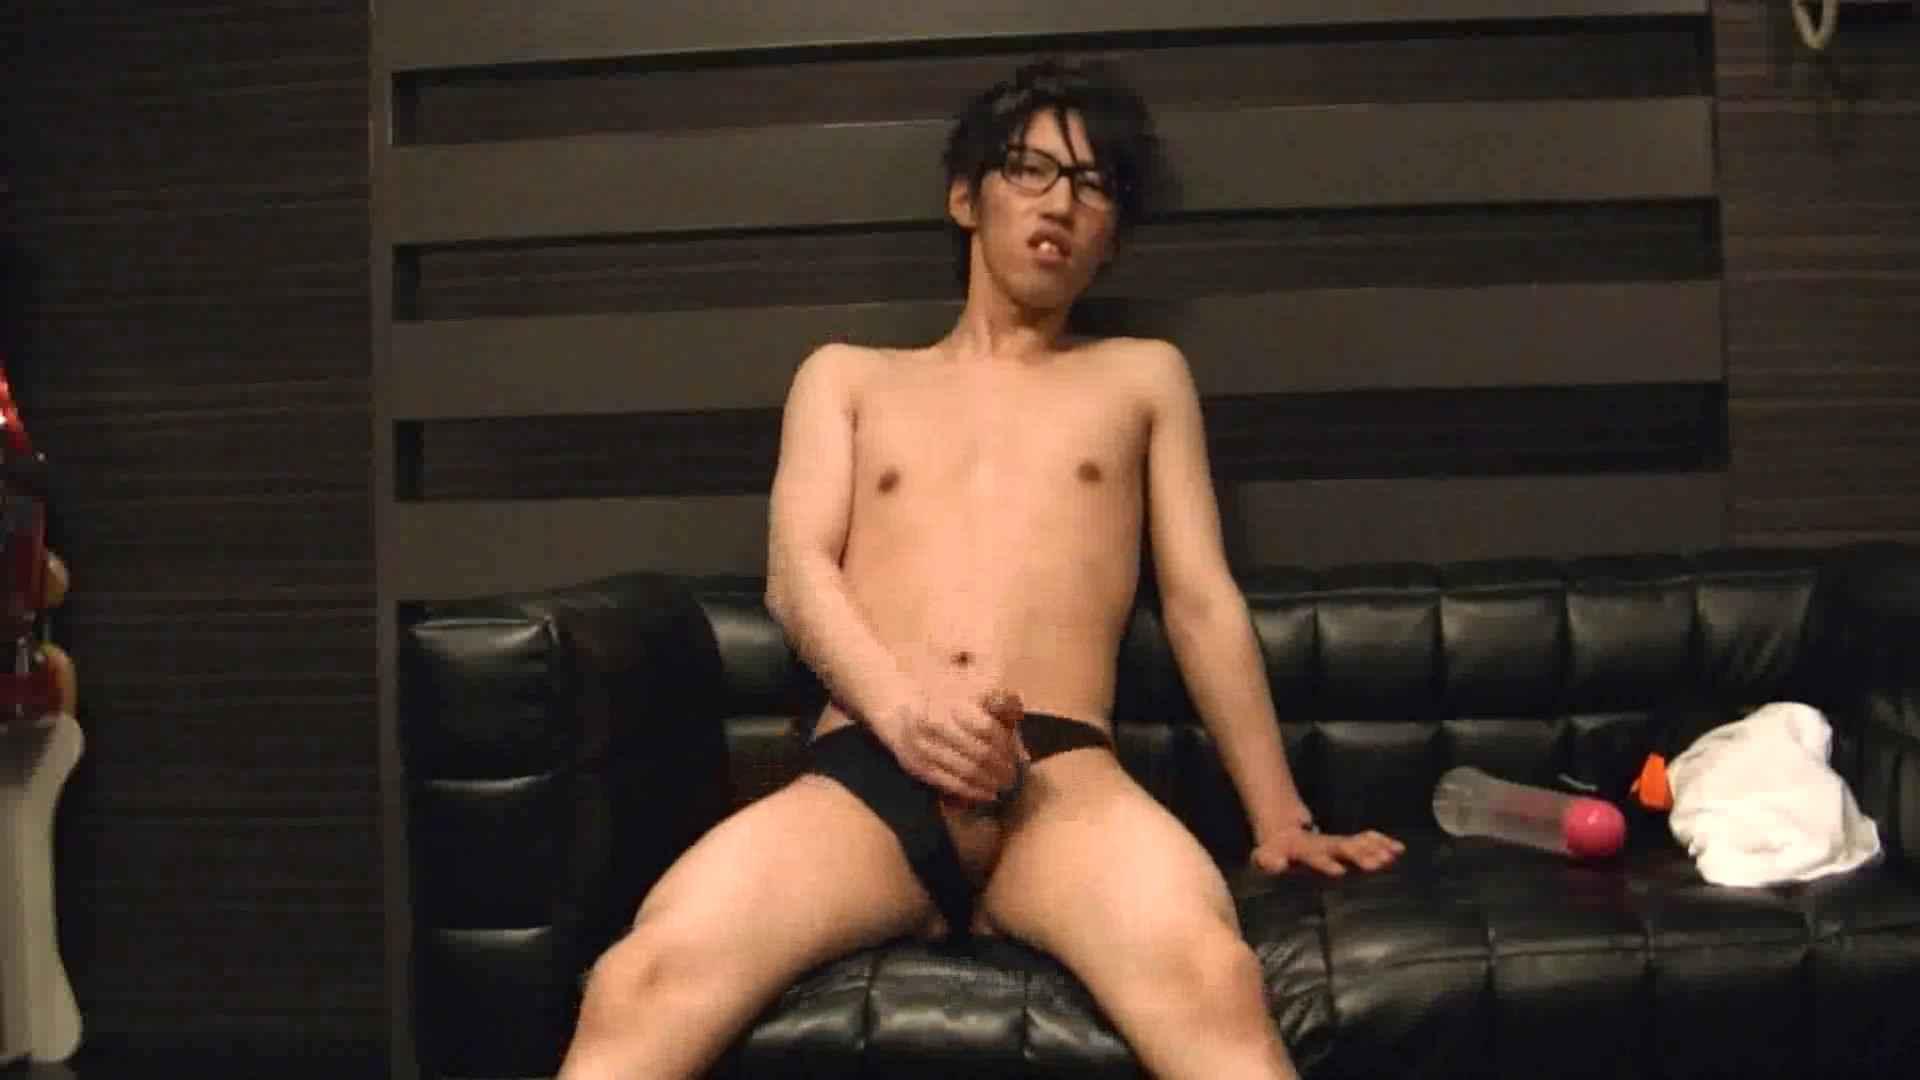 ONA見せカーニバル!! Vol3 男  93pic 90